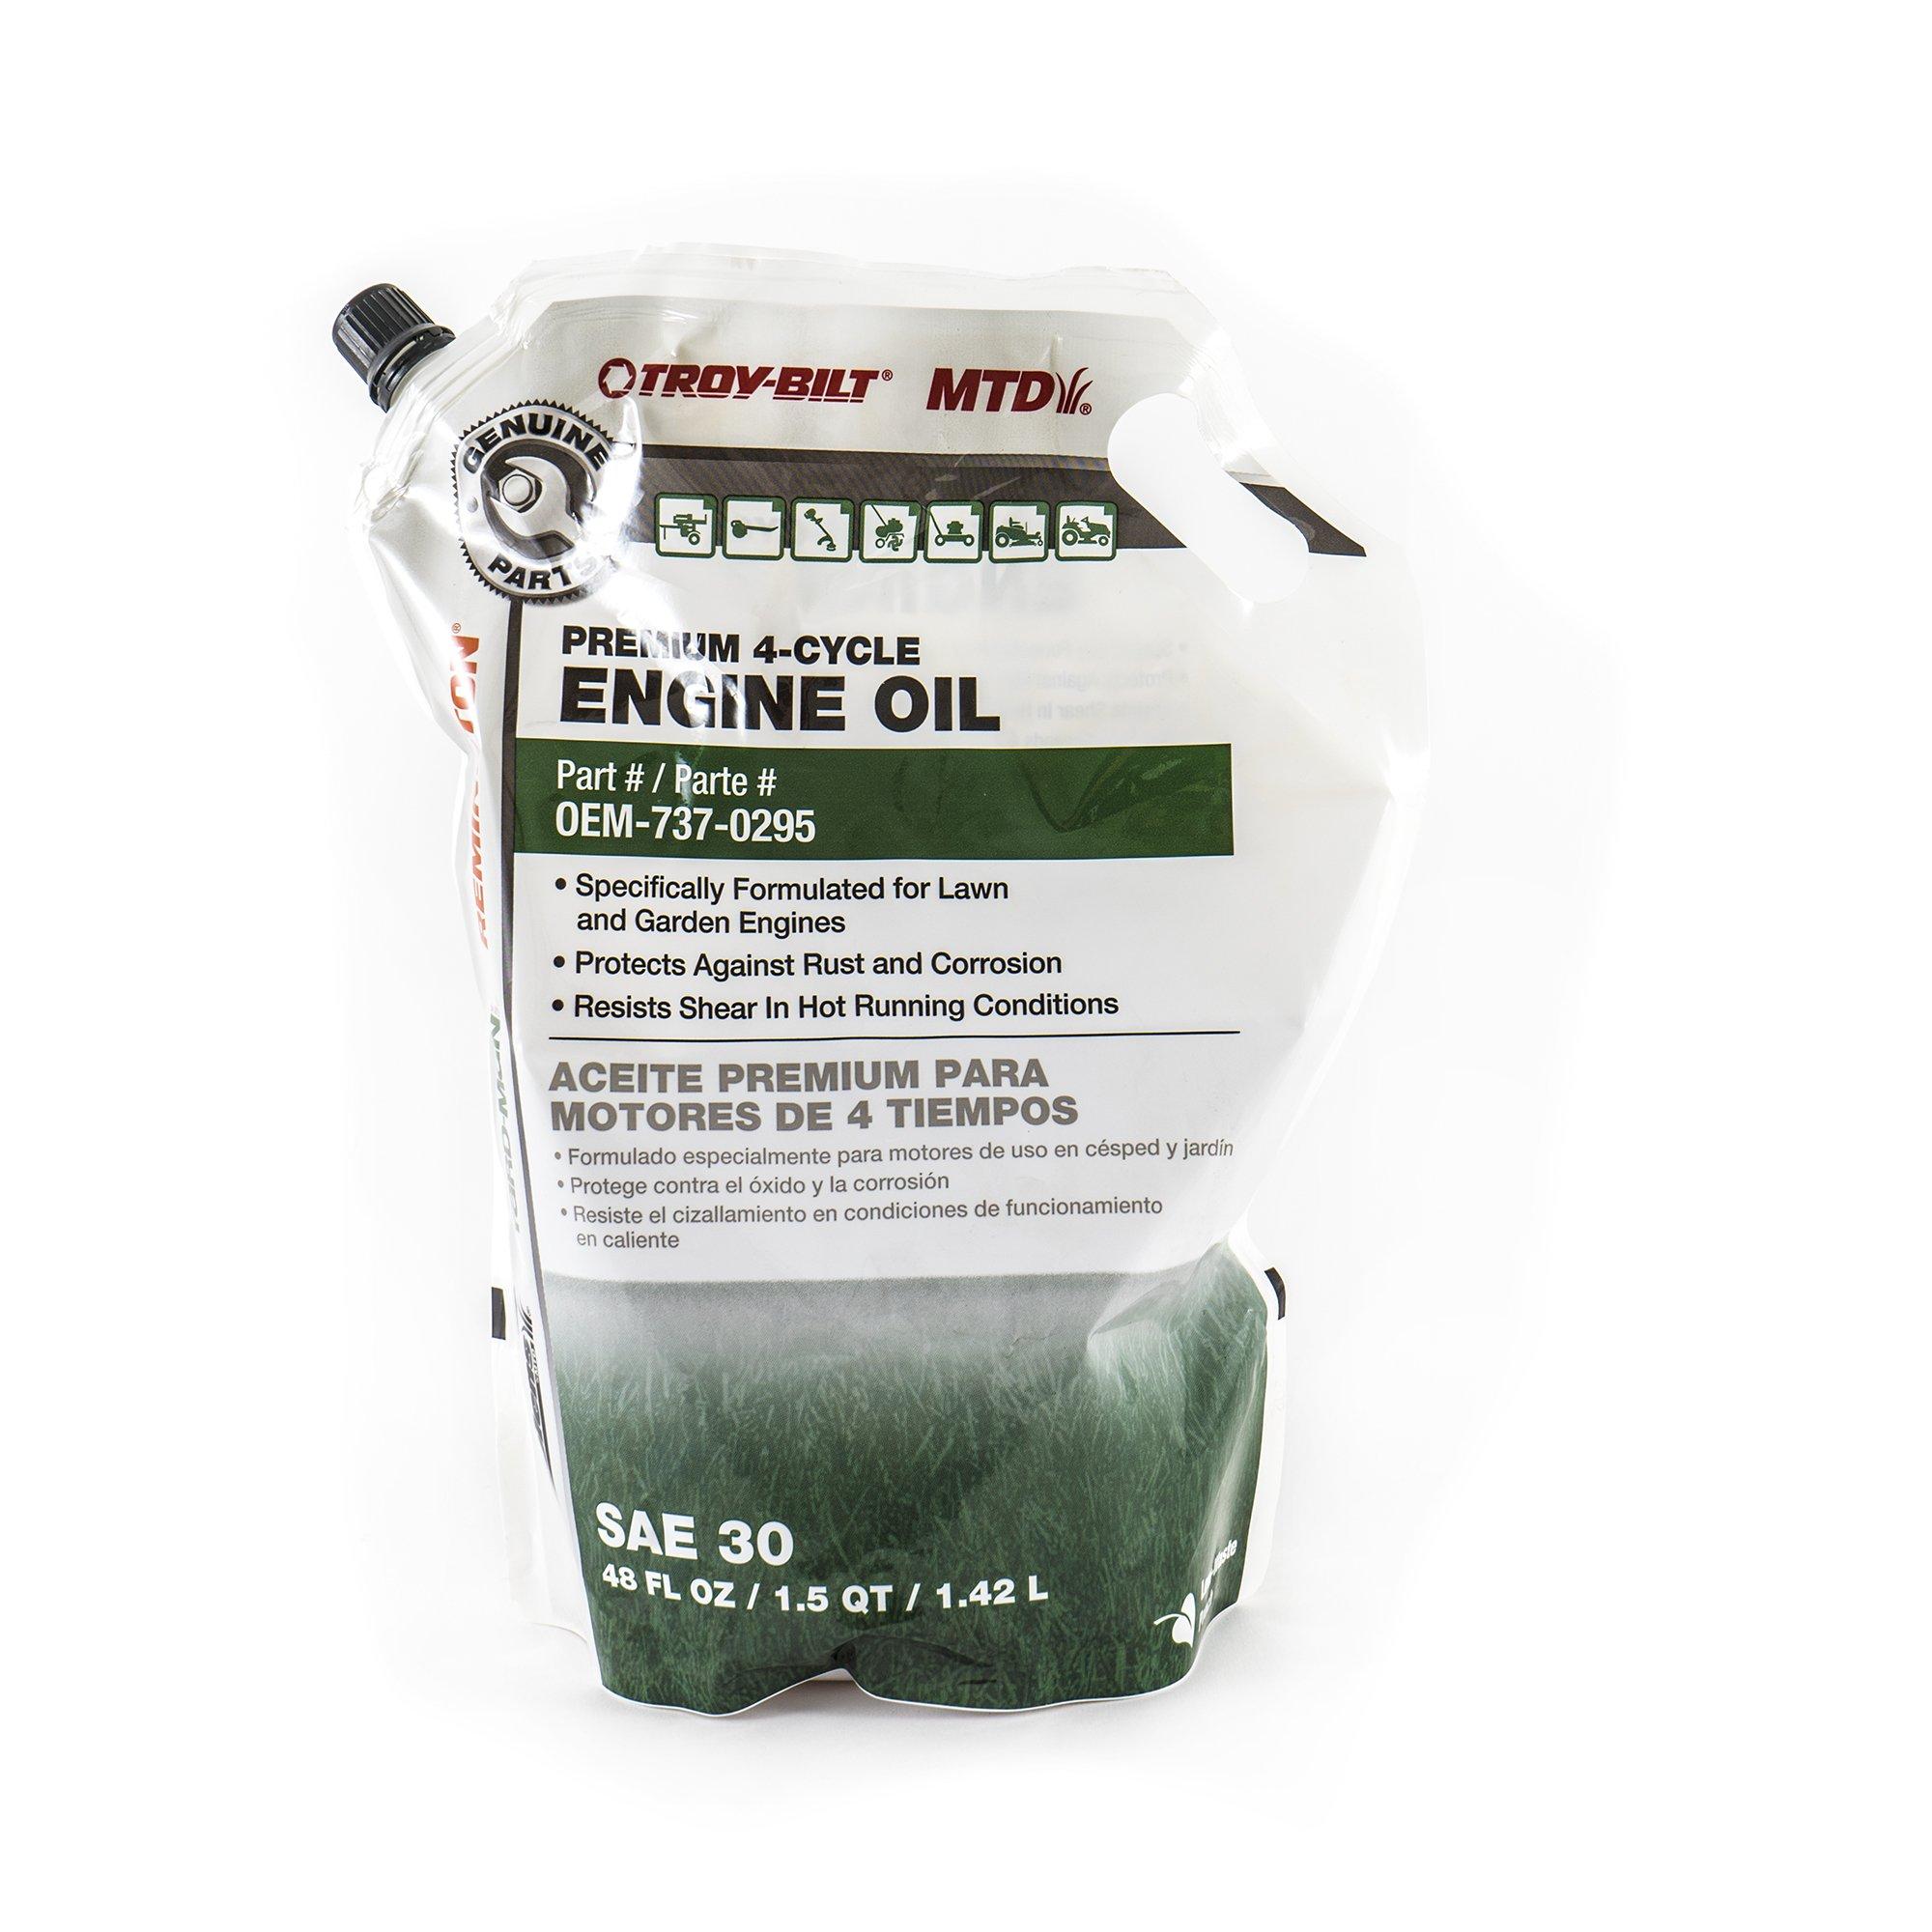 MTD Genuine Parts 48 oz. Premium 4-Cycle Engine Oil